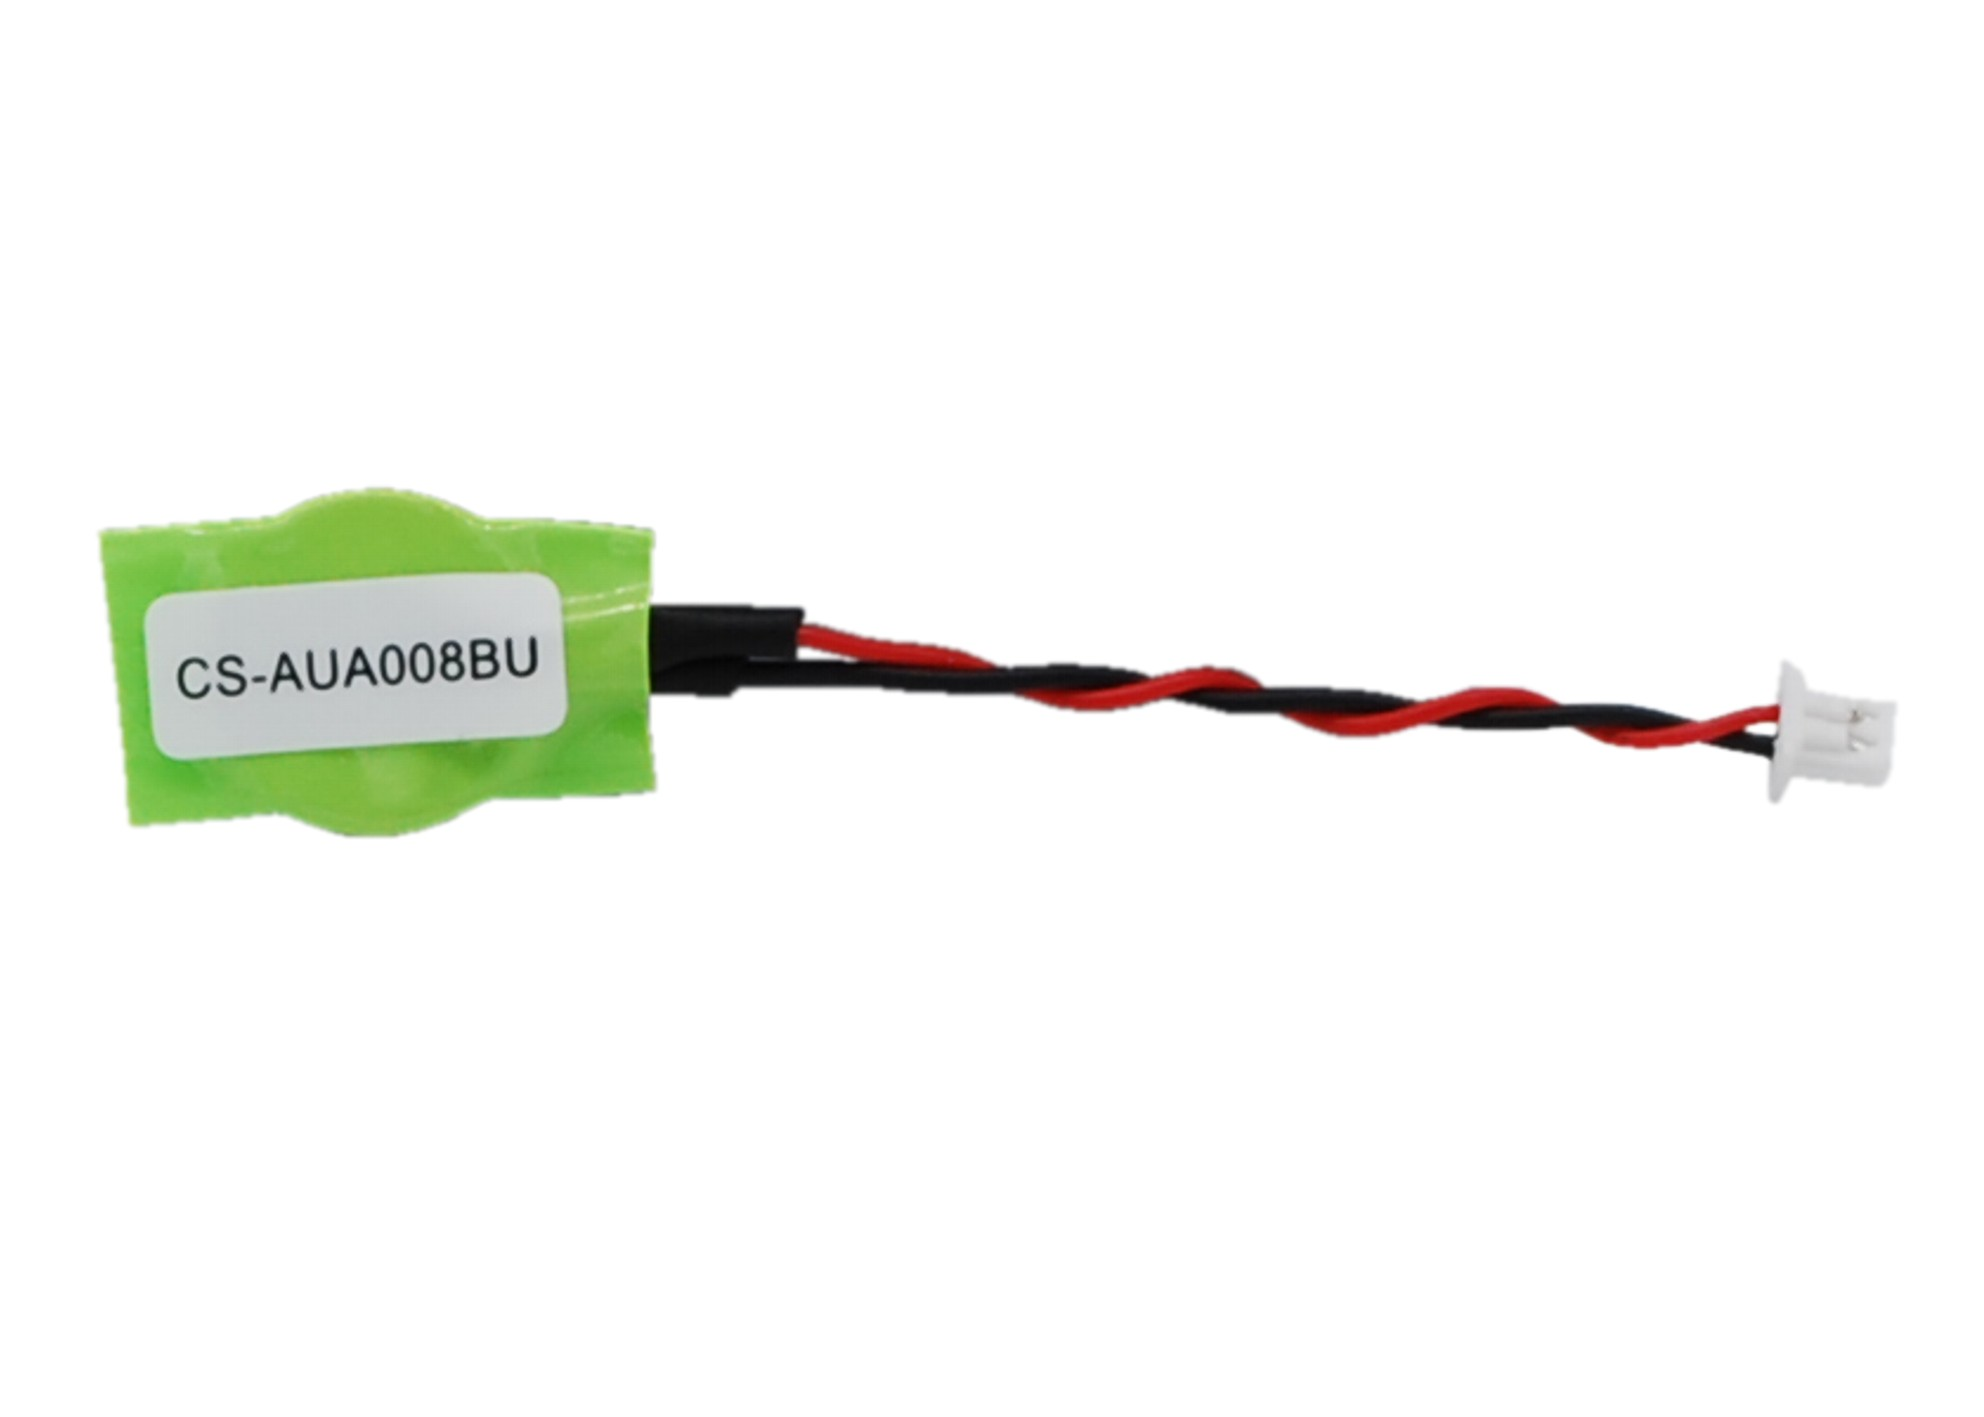 Cameron Sino baterie cmos pro ASUS Eee PC 1005HA-EU1X 3V Li-ion 40mAh zelená - neoriginální